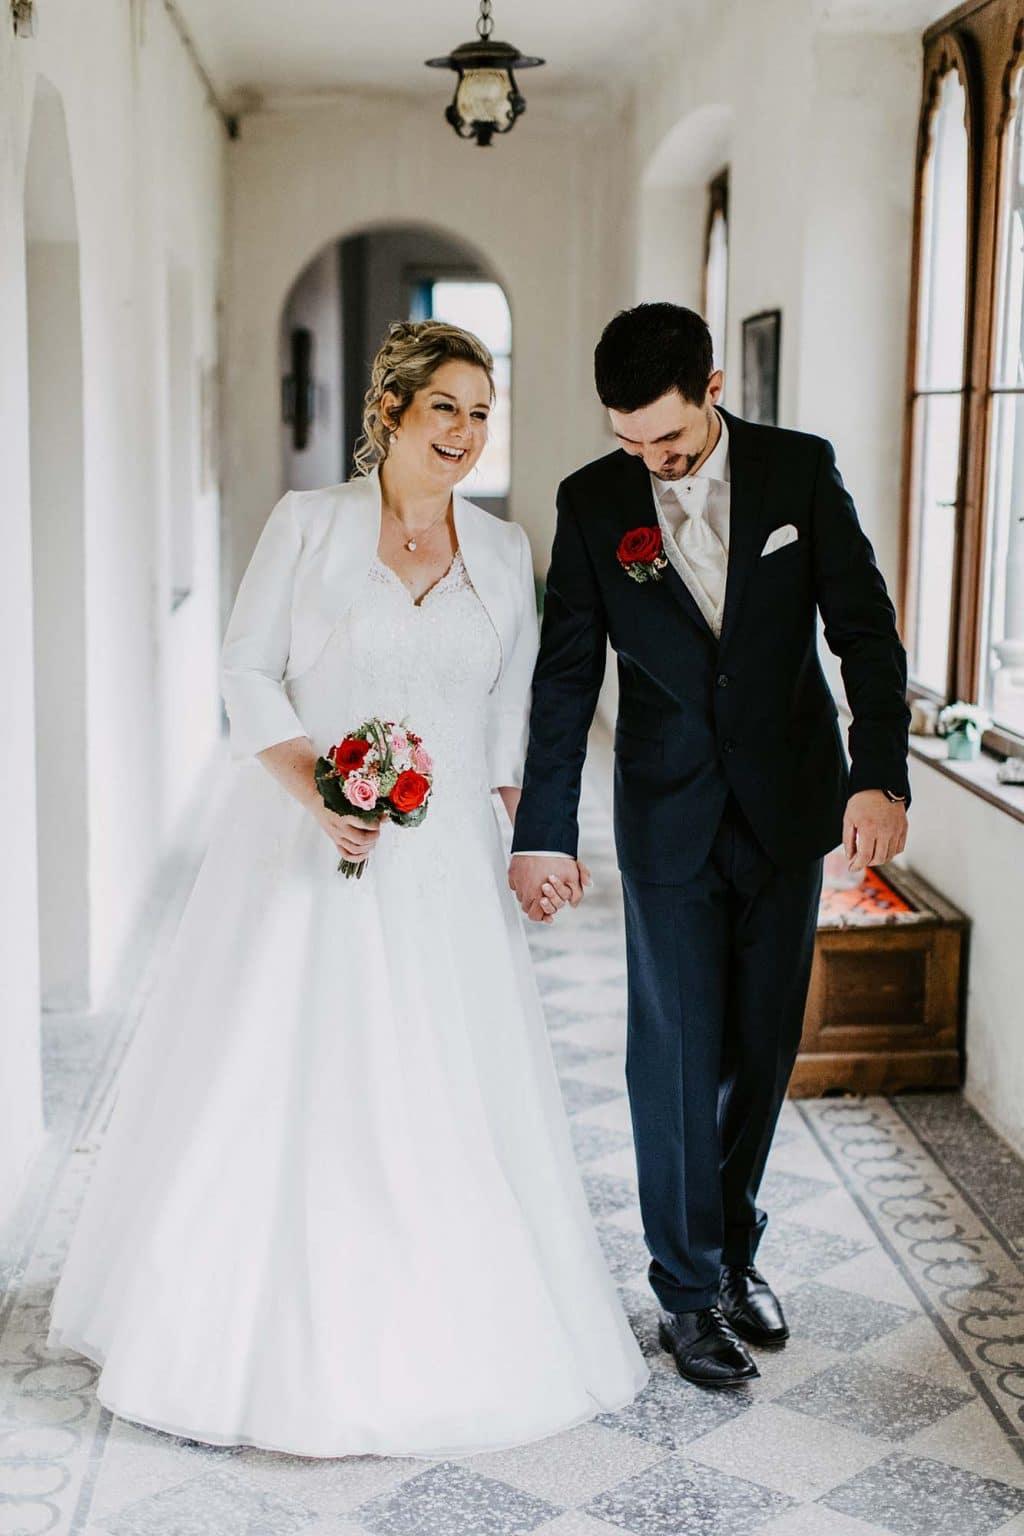 Hochzeitsfotograf Michael Schartner